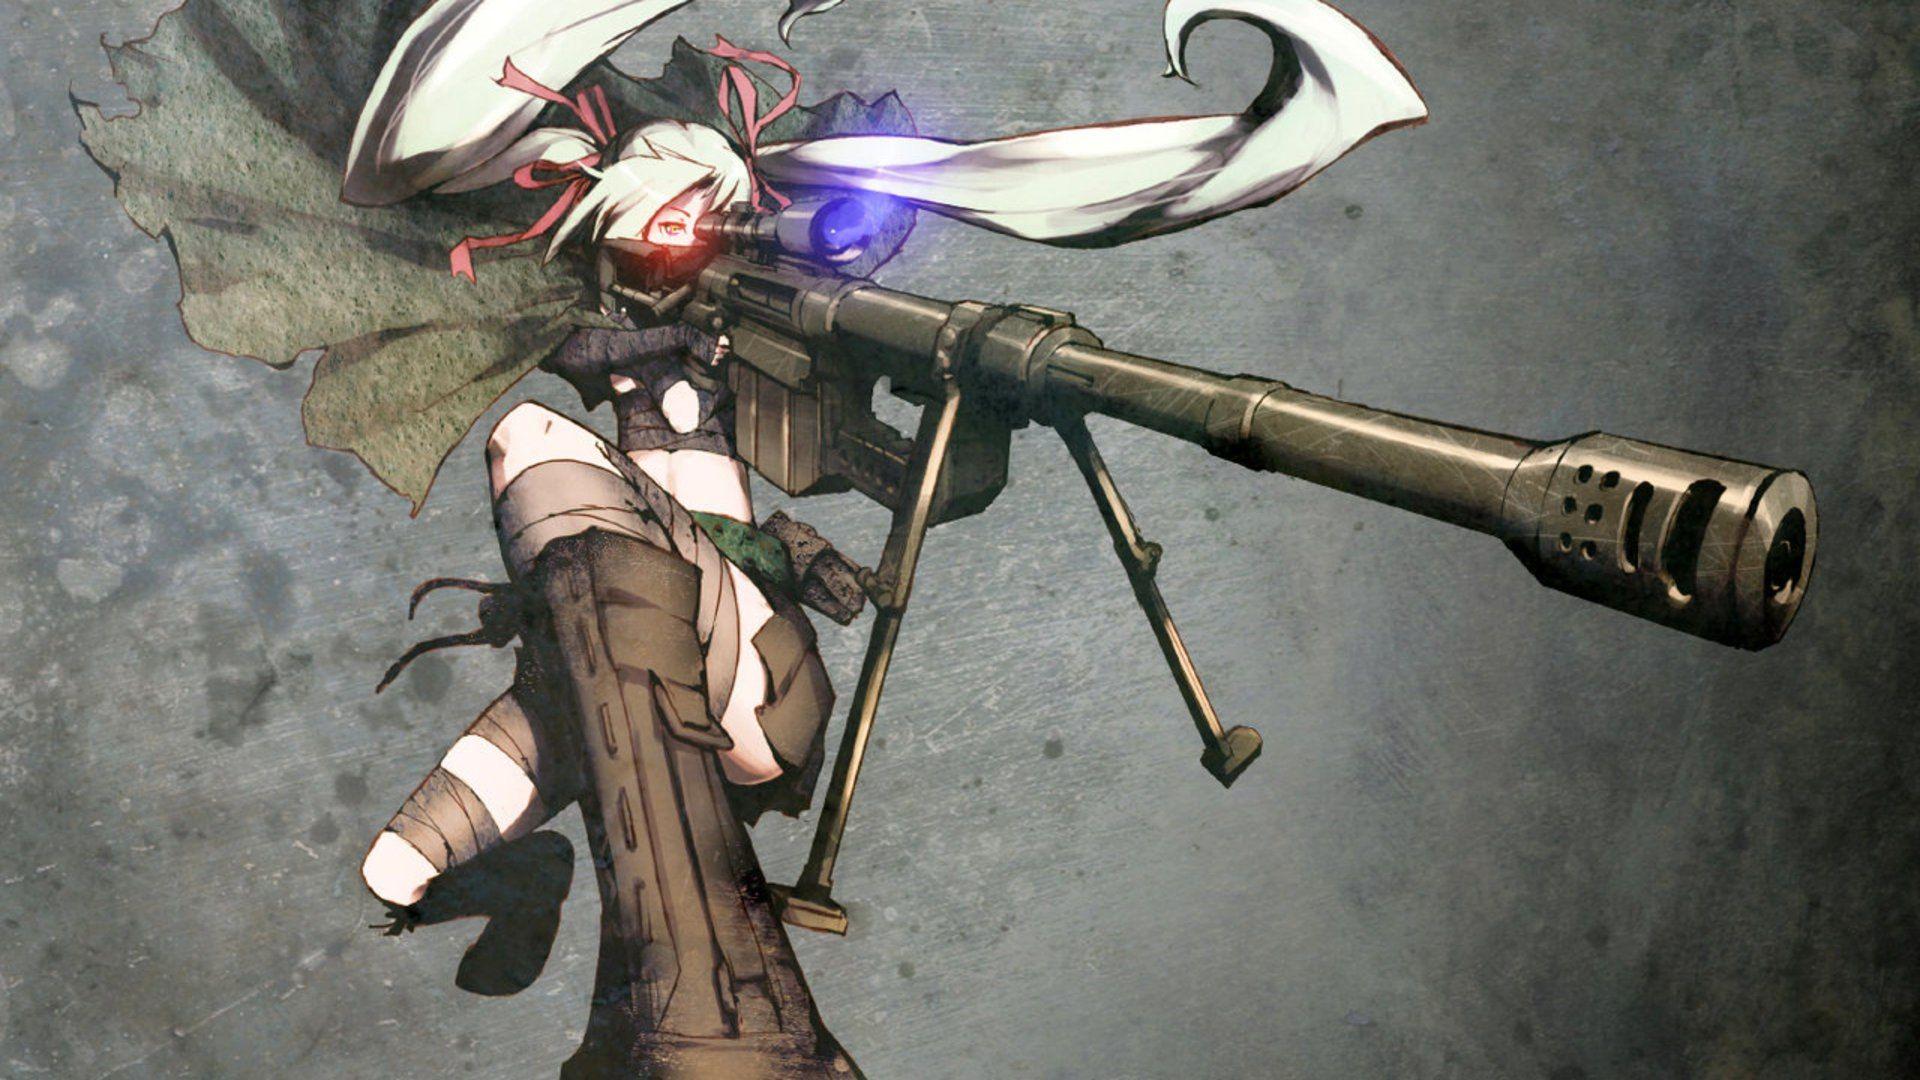 3811dba7b0776350b04c60ef76749bc5 Vacwgucuxqzgjcqup Jpg 1920 1080 Gunslinger Girl Sniper Girl Cool Anime Wallpapers